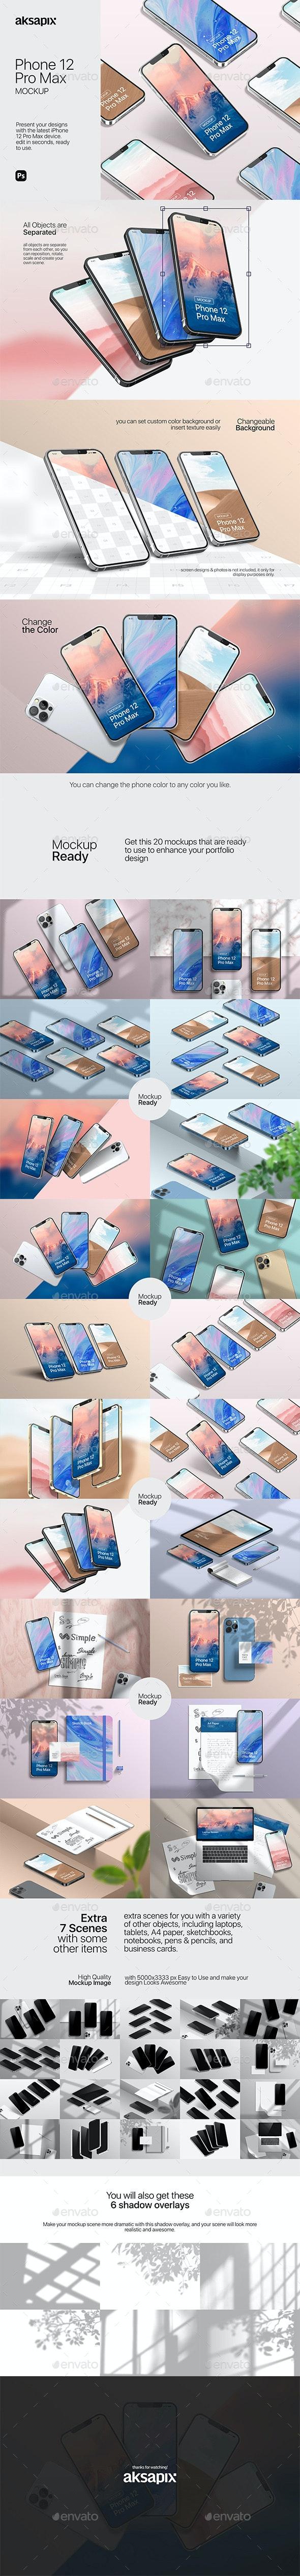 Phone 12 Mockup 2020 V.02